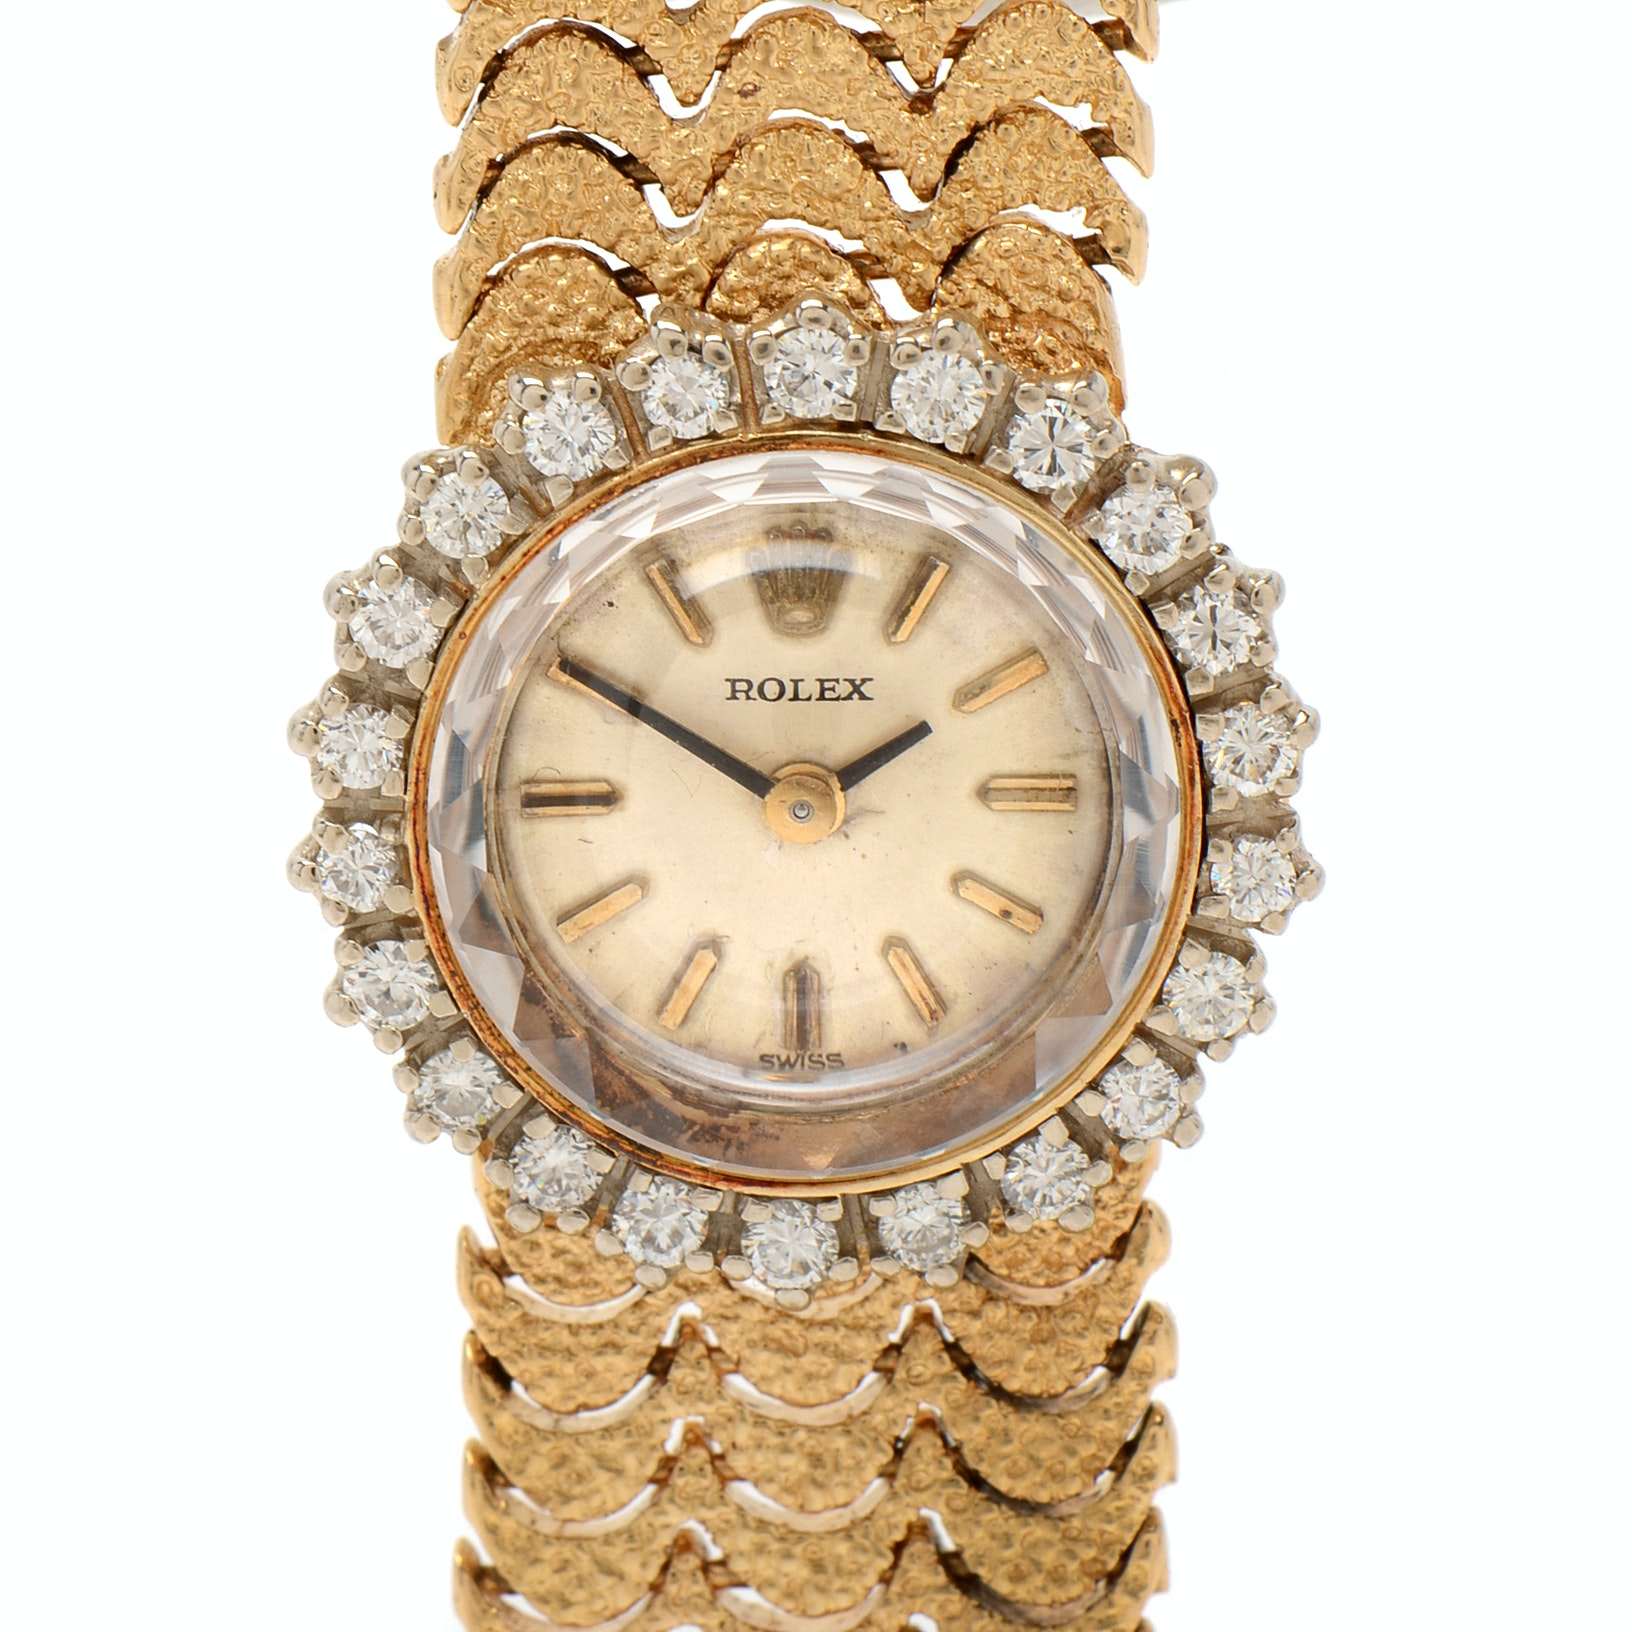 1960s Rolex 14K Yellow Gold and Diamond Bezel Wristwatch